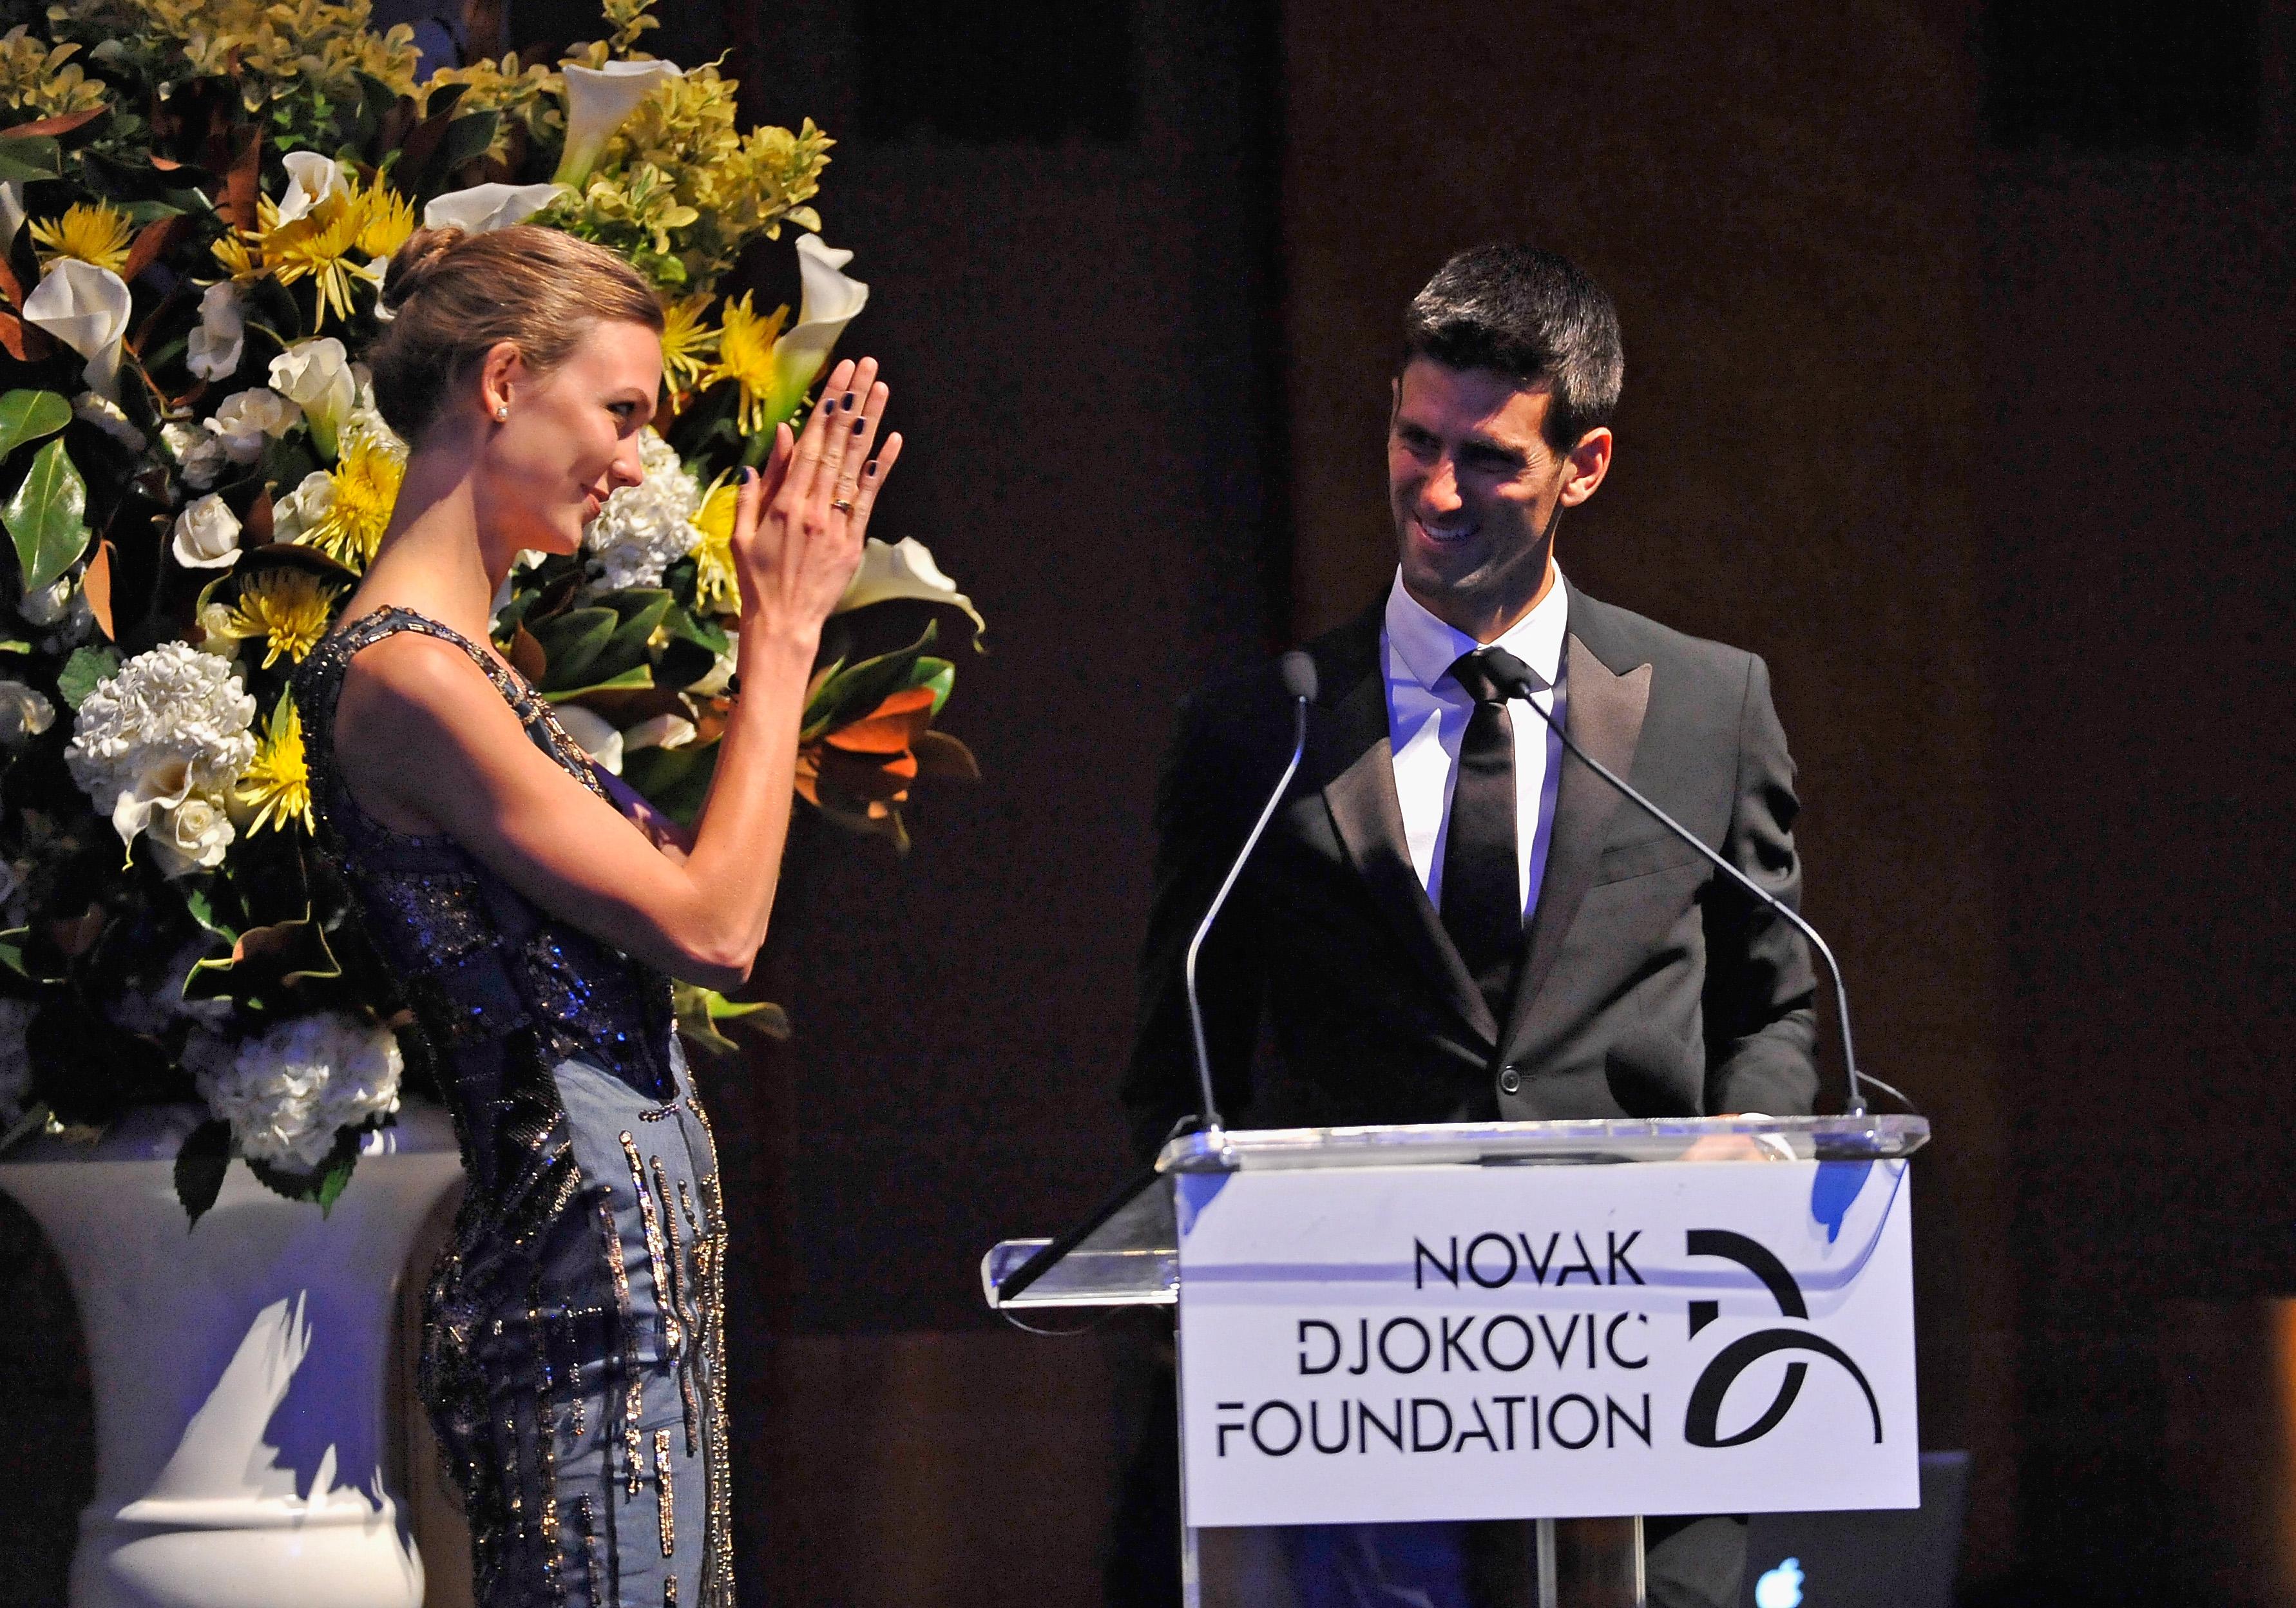 Novak Djokovic Foundation Charity Dinner Novak Djokovic